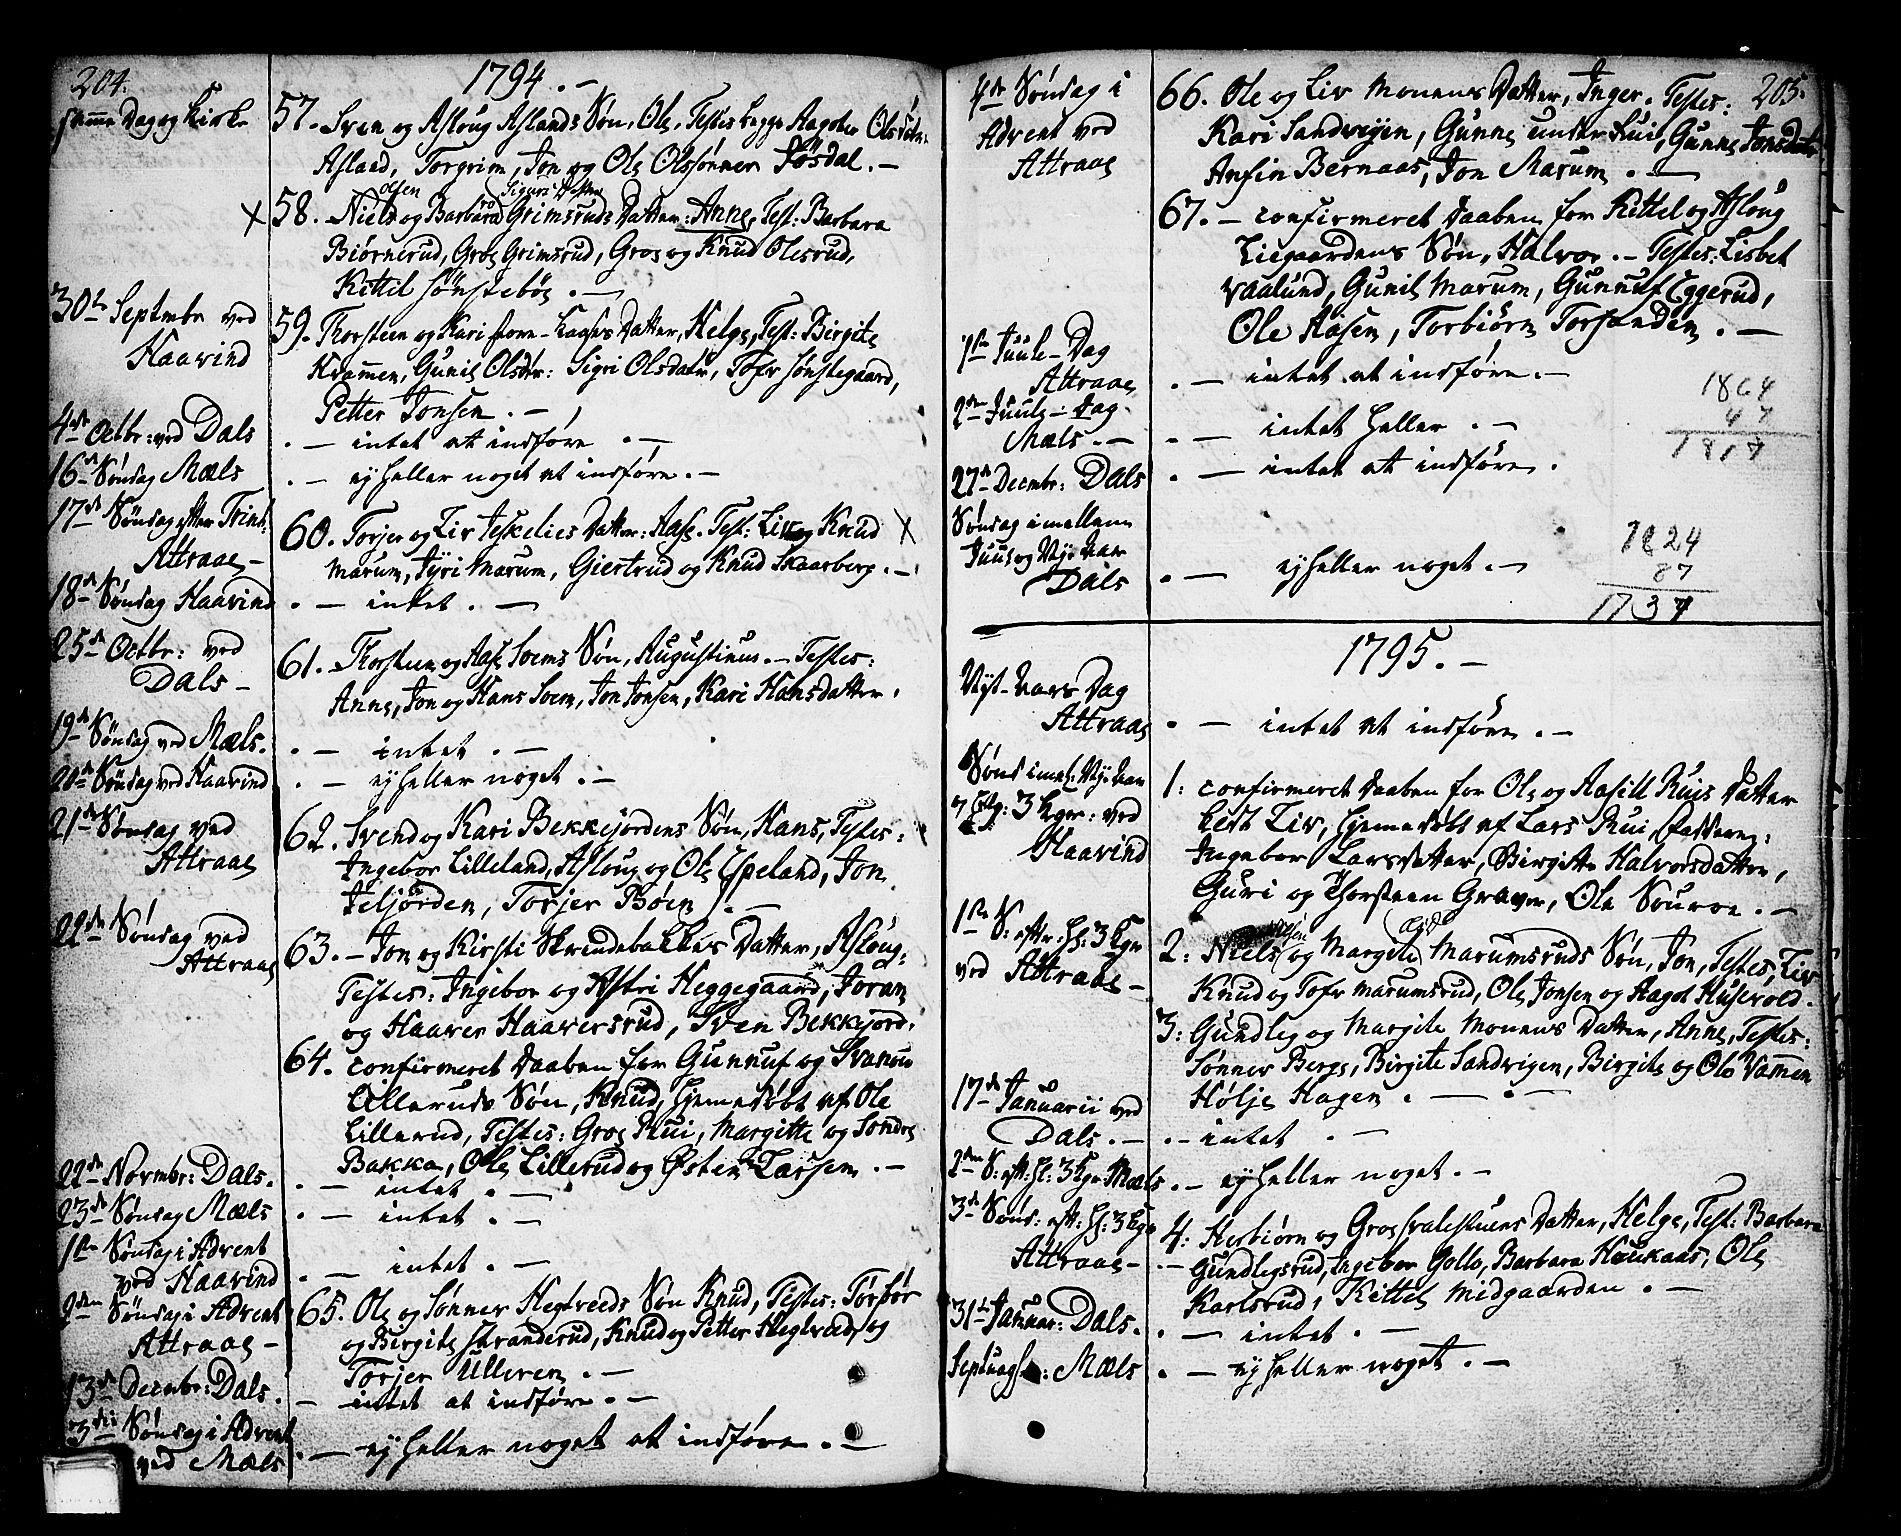 SAKO, Tinn kirkebøker, F/Fa/L0002: Ministerialbok nr. I 2, 1757-1810, s. 204-205